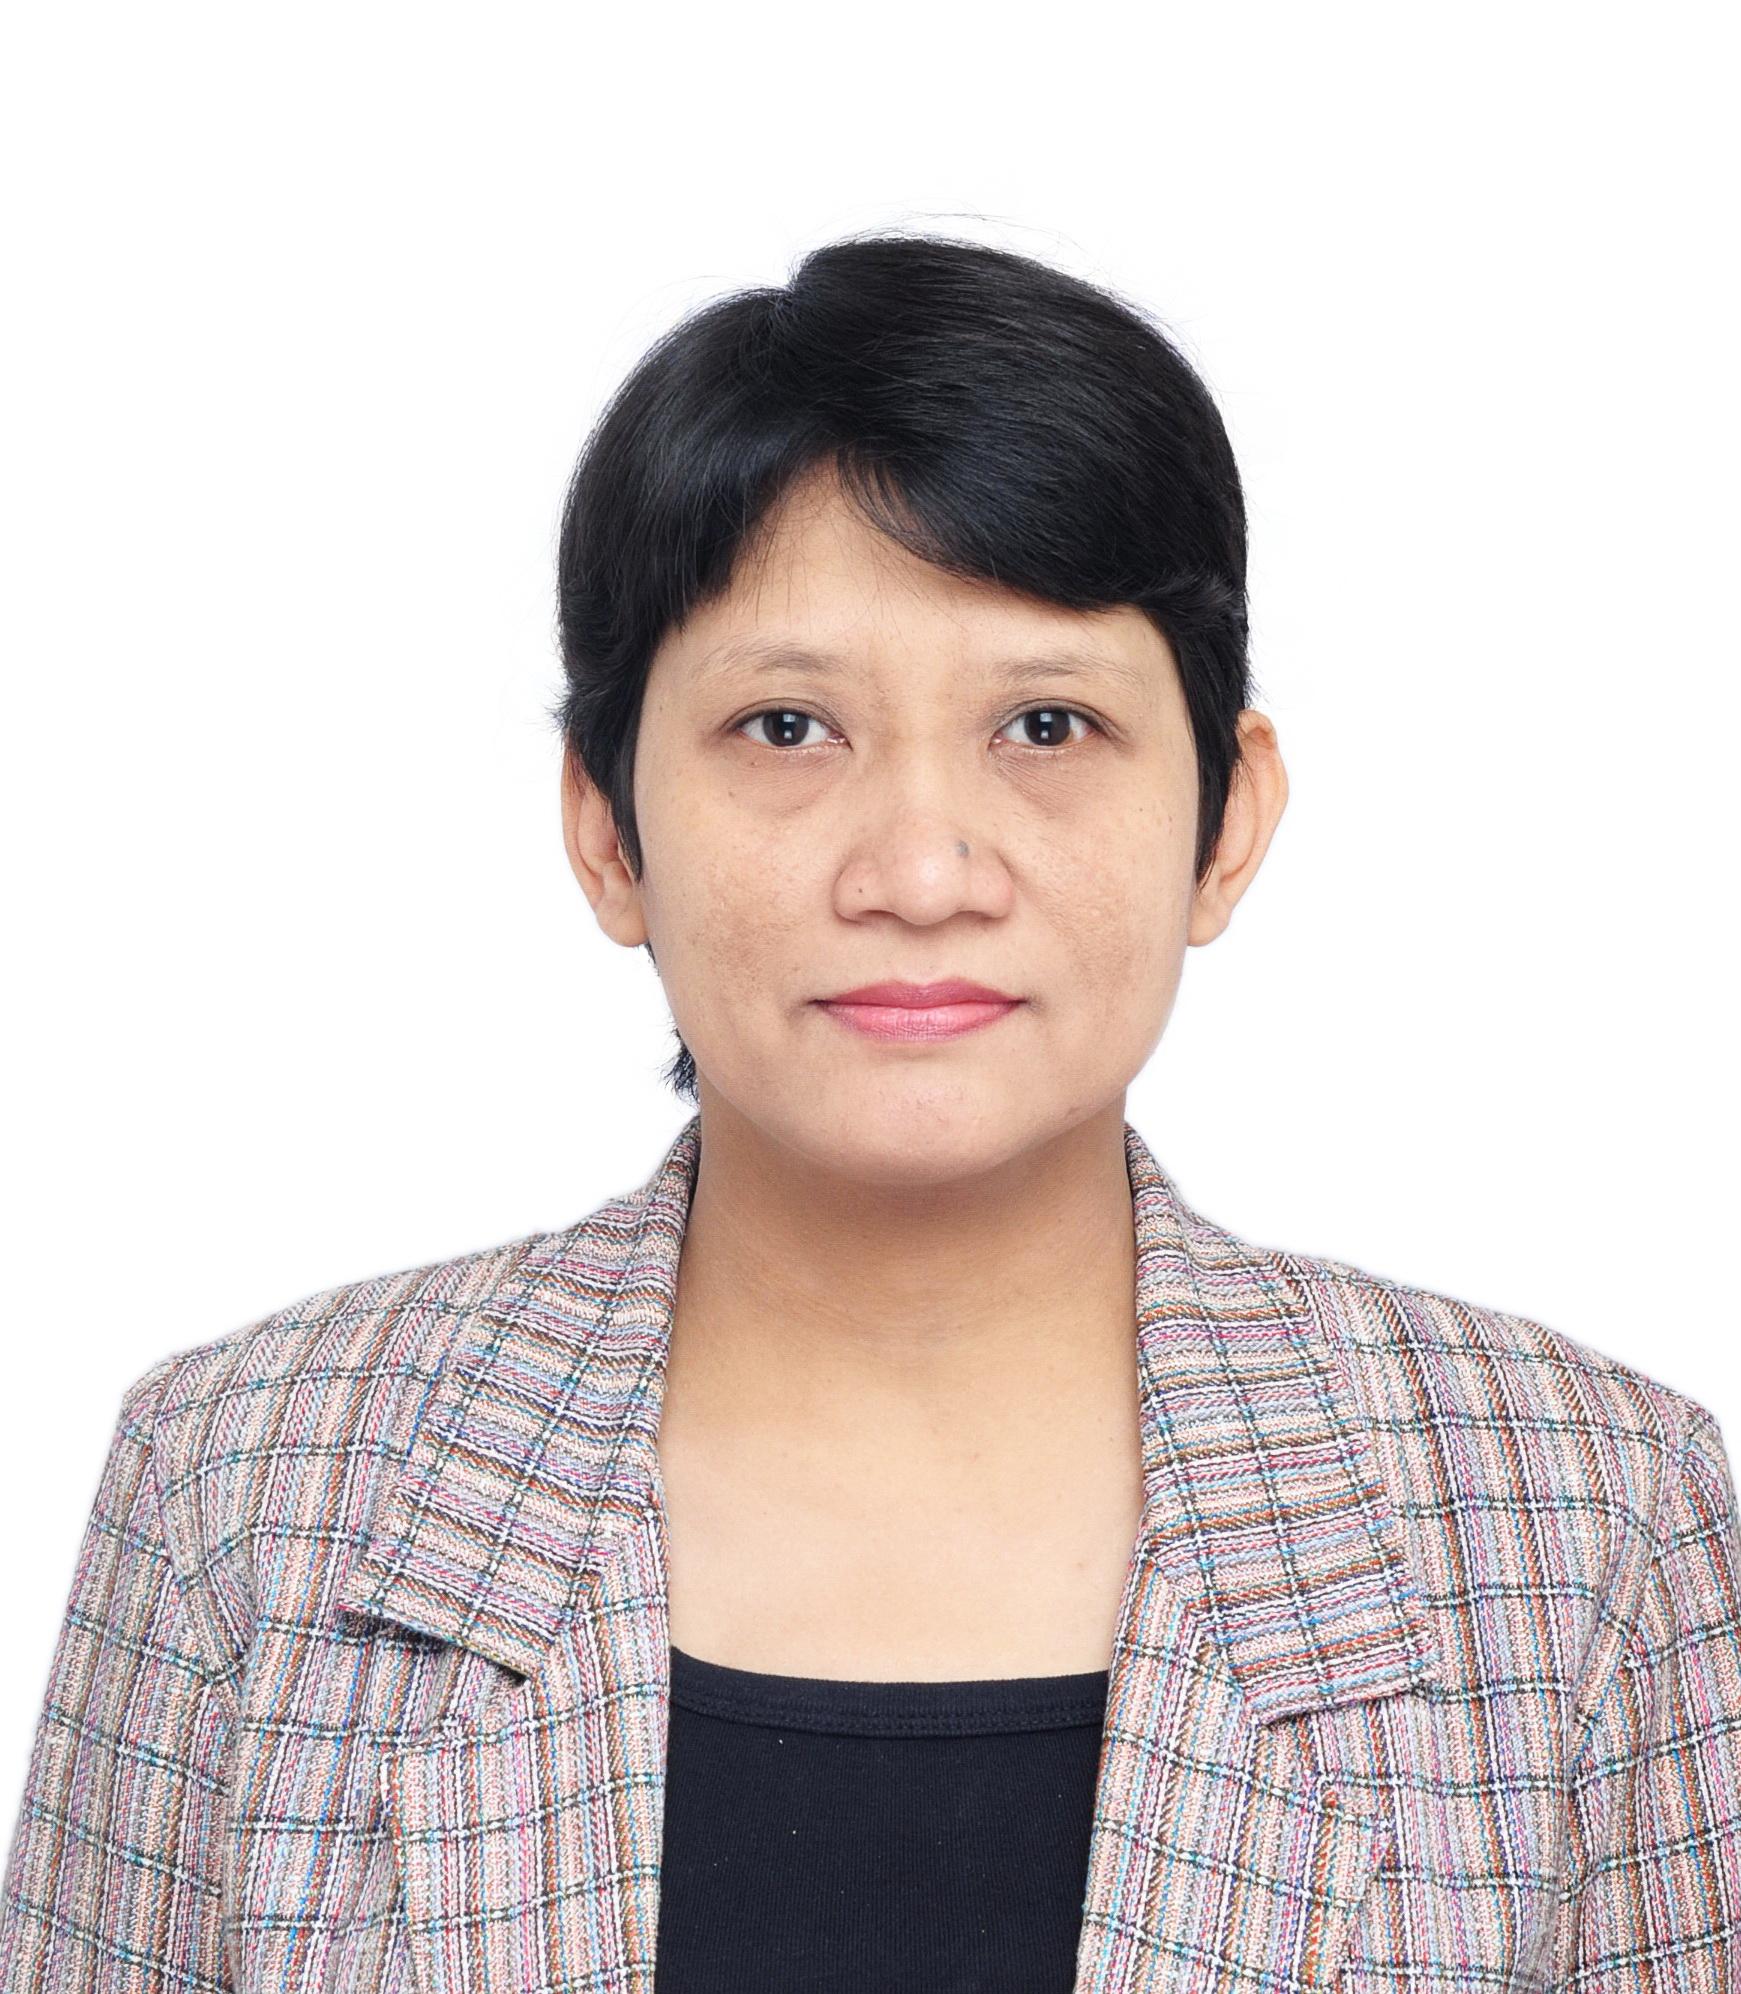 Yuliawati Dwi Widyaningrum 사진